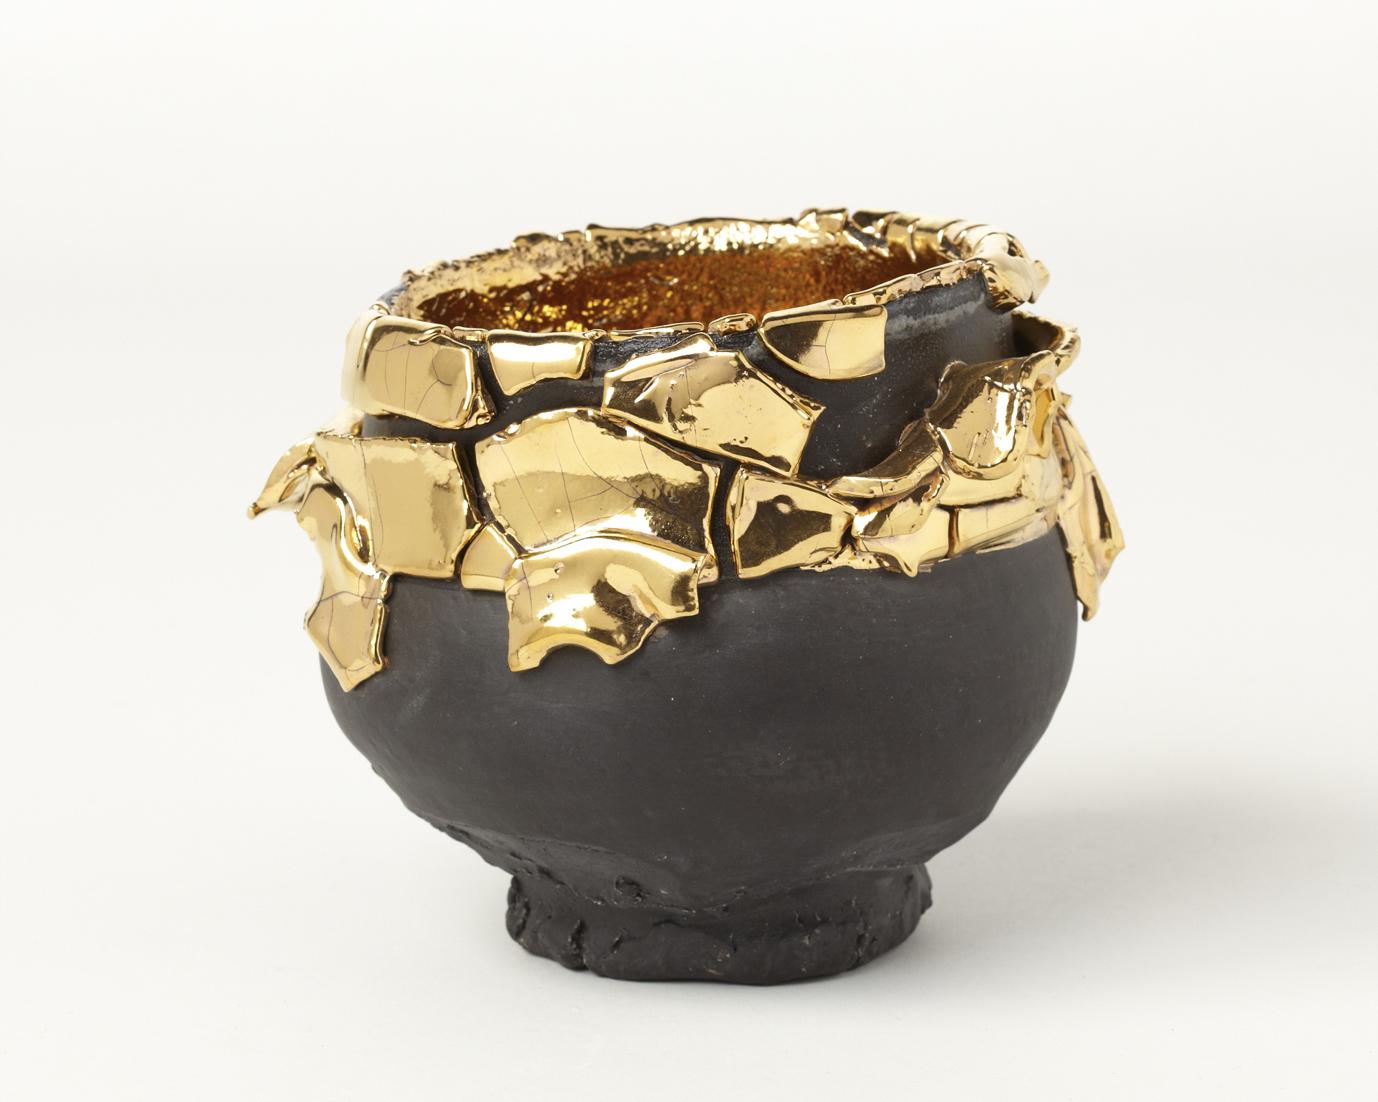 Extraordinary Contemporary Sculptures by Kuwata - Black-slipped Gold Kairagi Shino bowl takuro kuwata Extraordinary Contemporary Sculptures by Takuro Kuwata Extraordinary Contemporary Sculptures by Takuro Kuwata Black slipped Gold Kairagi Shino bowl